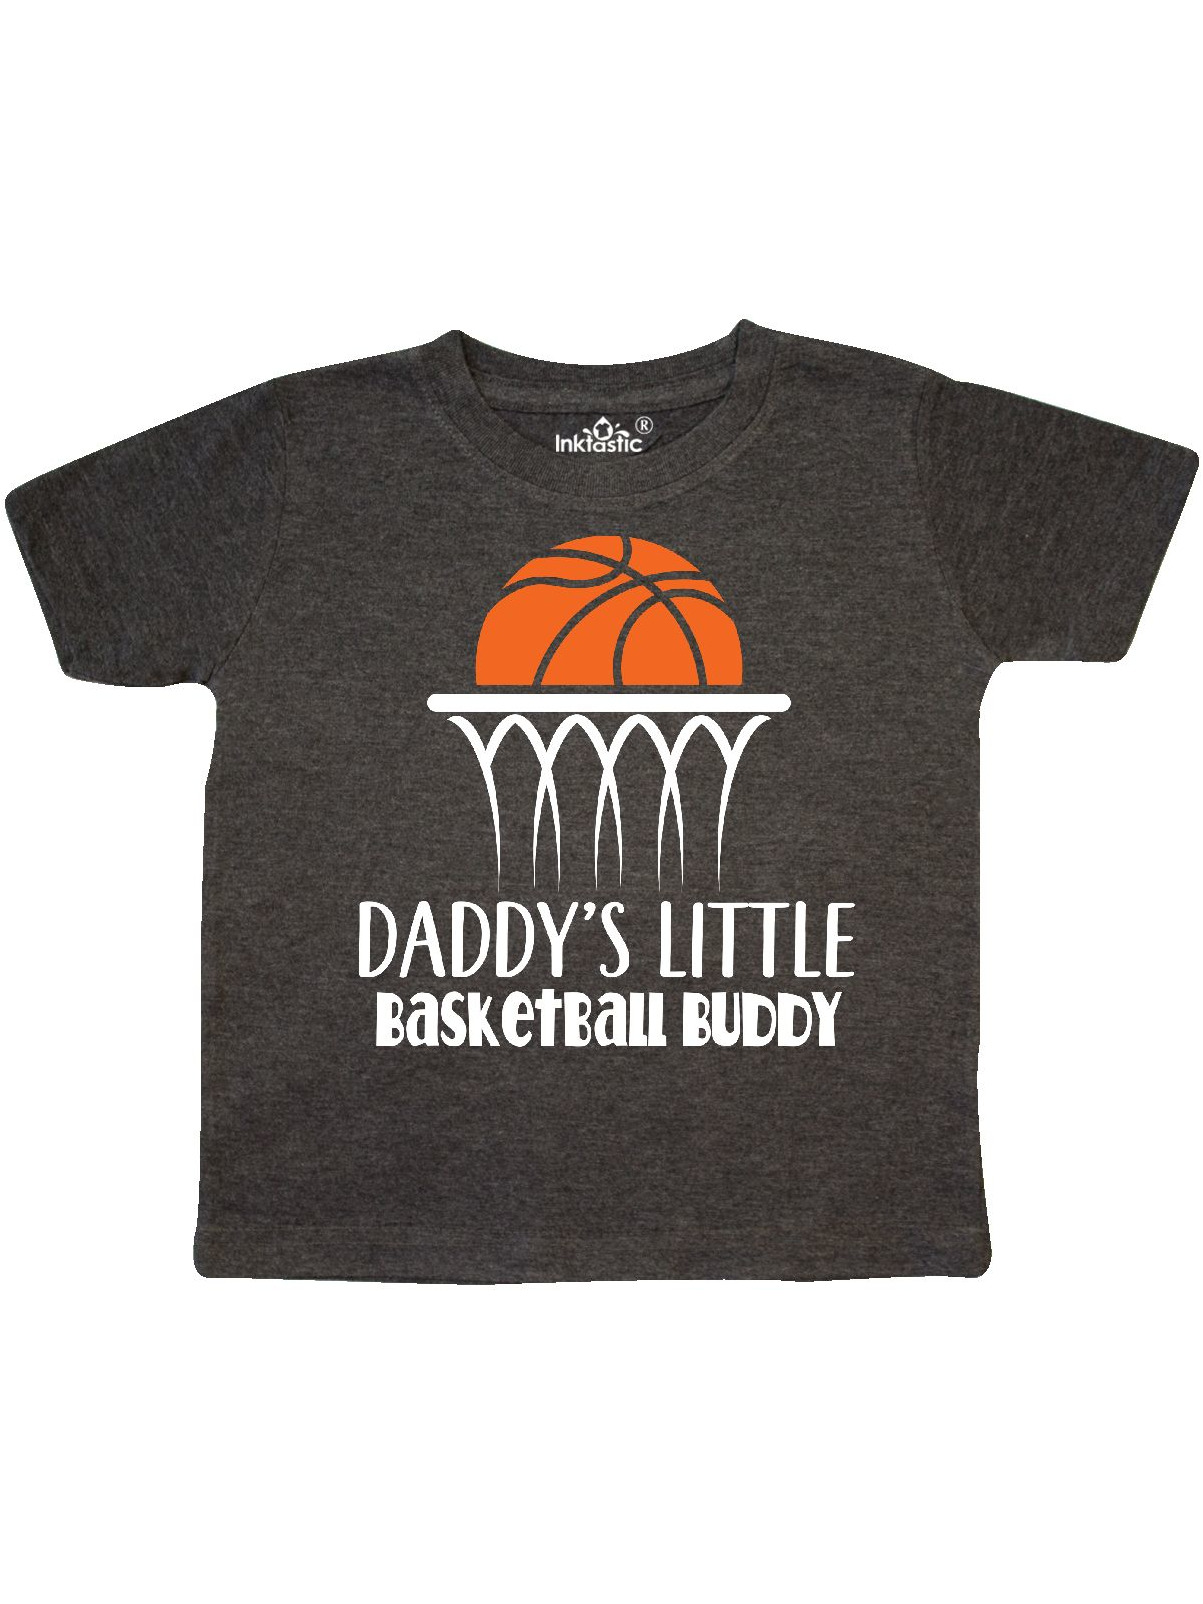 Daddys Little Basketball Buddy Boys Toddler T-Shirt